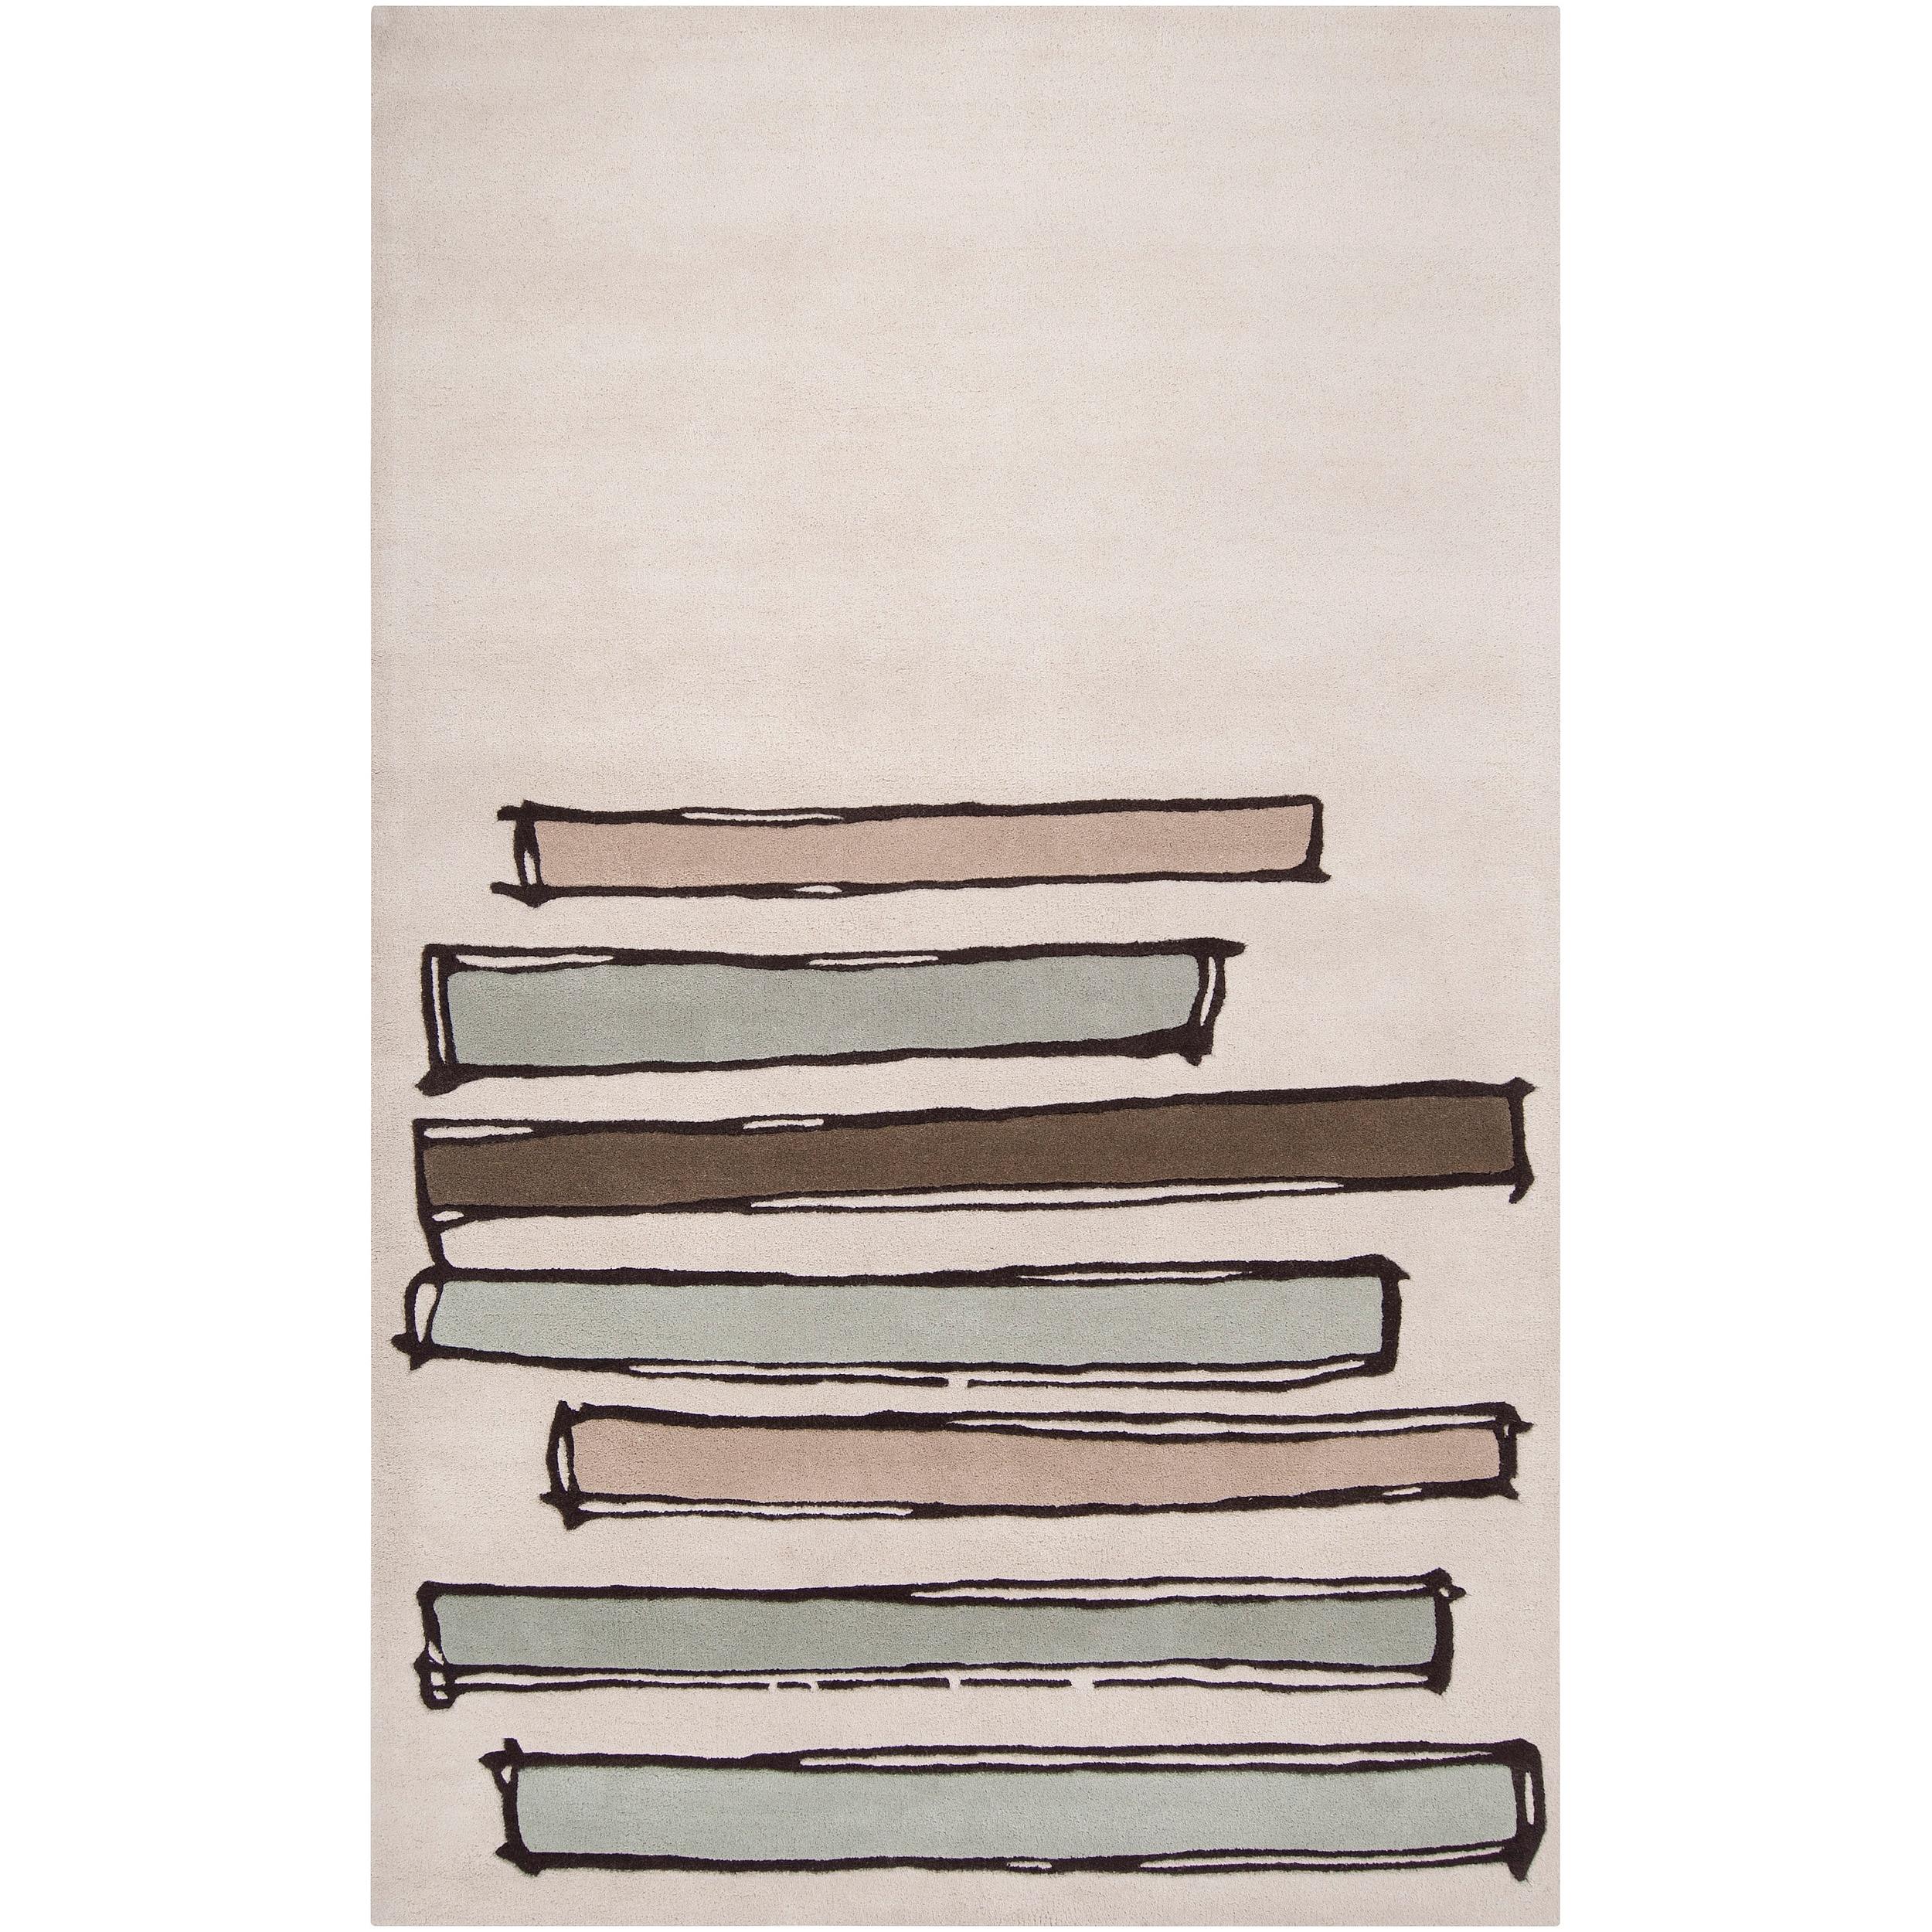 Noah Packard Hand-tufted Green/Beige Contemporary Rivera New Zealand Wool Abstract Rug (8' x 11')